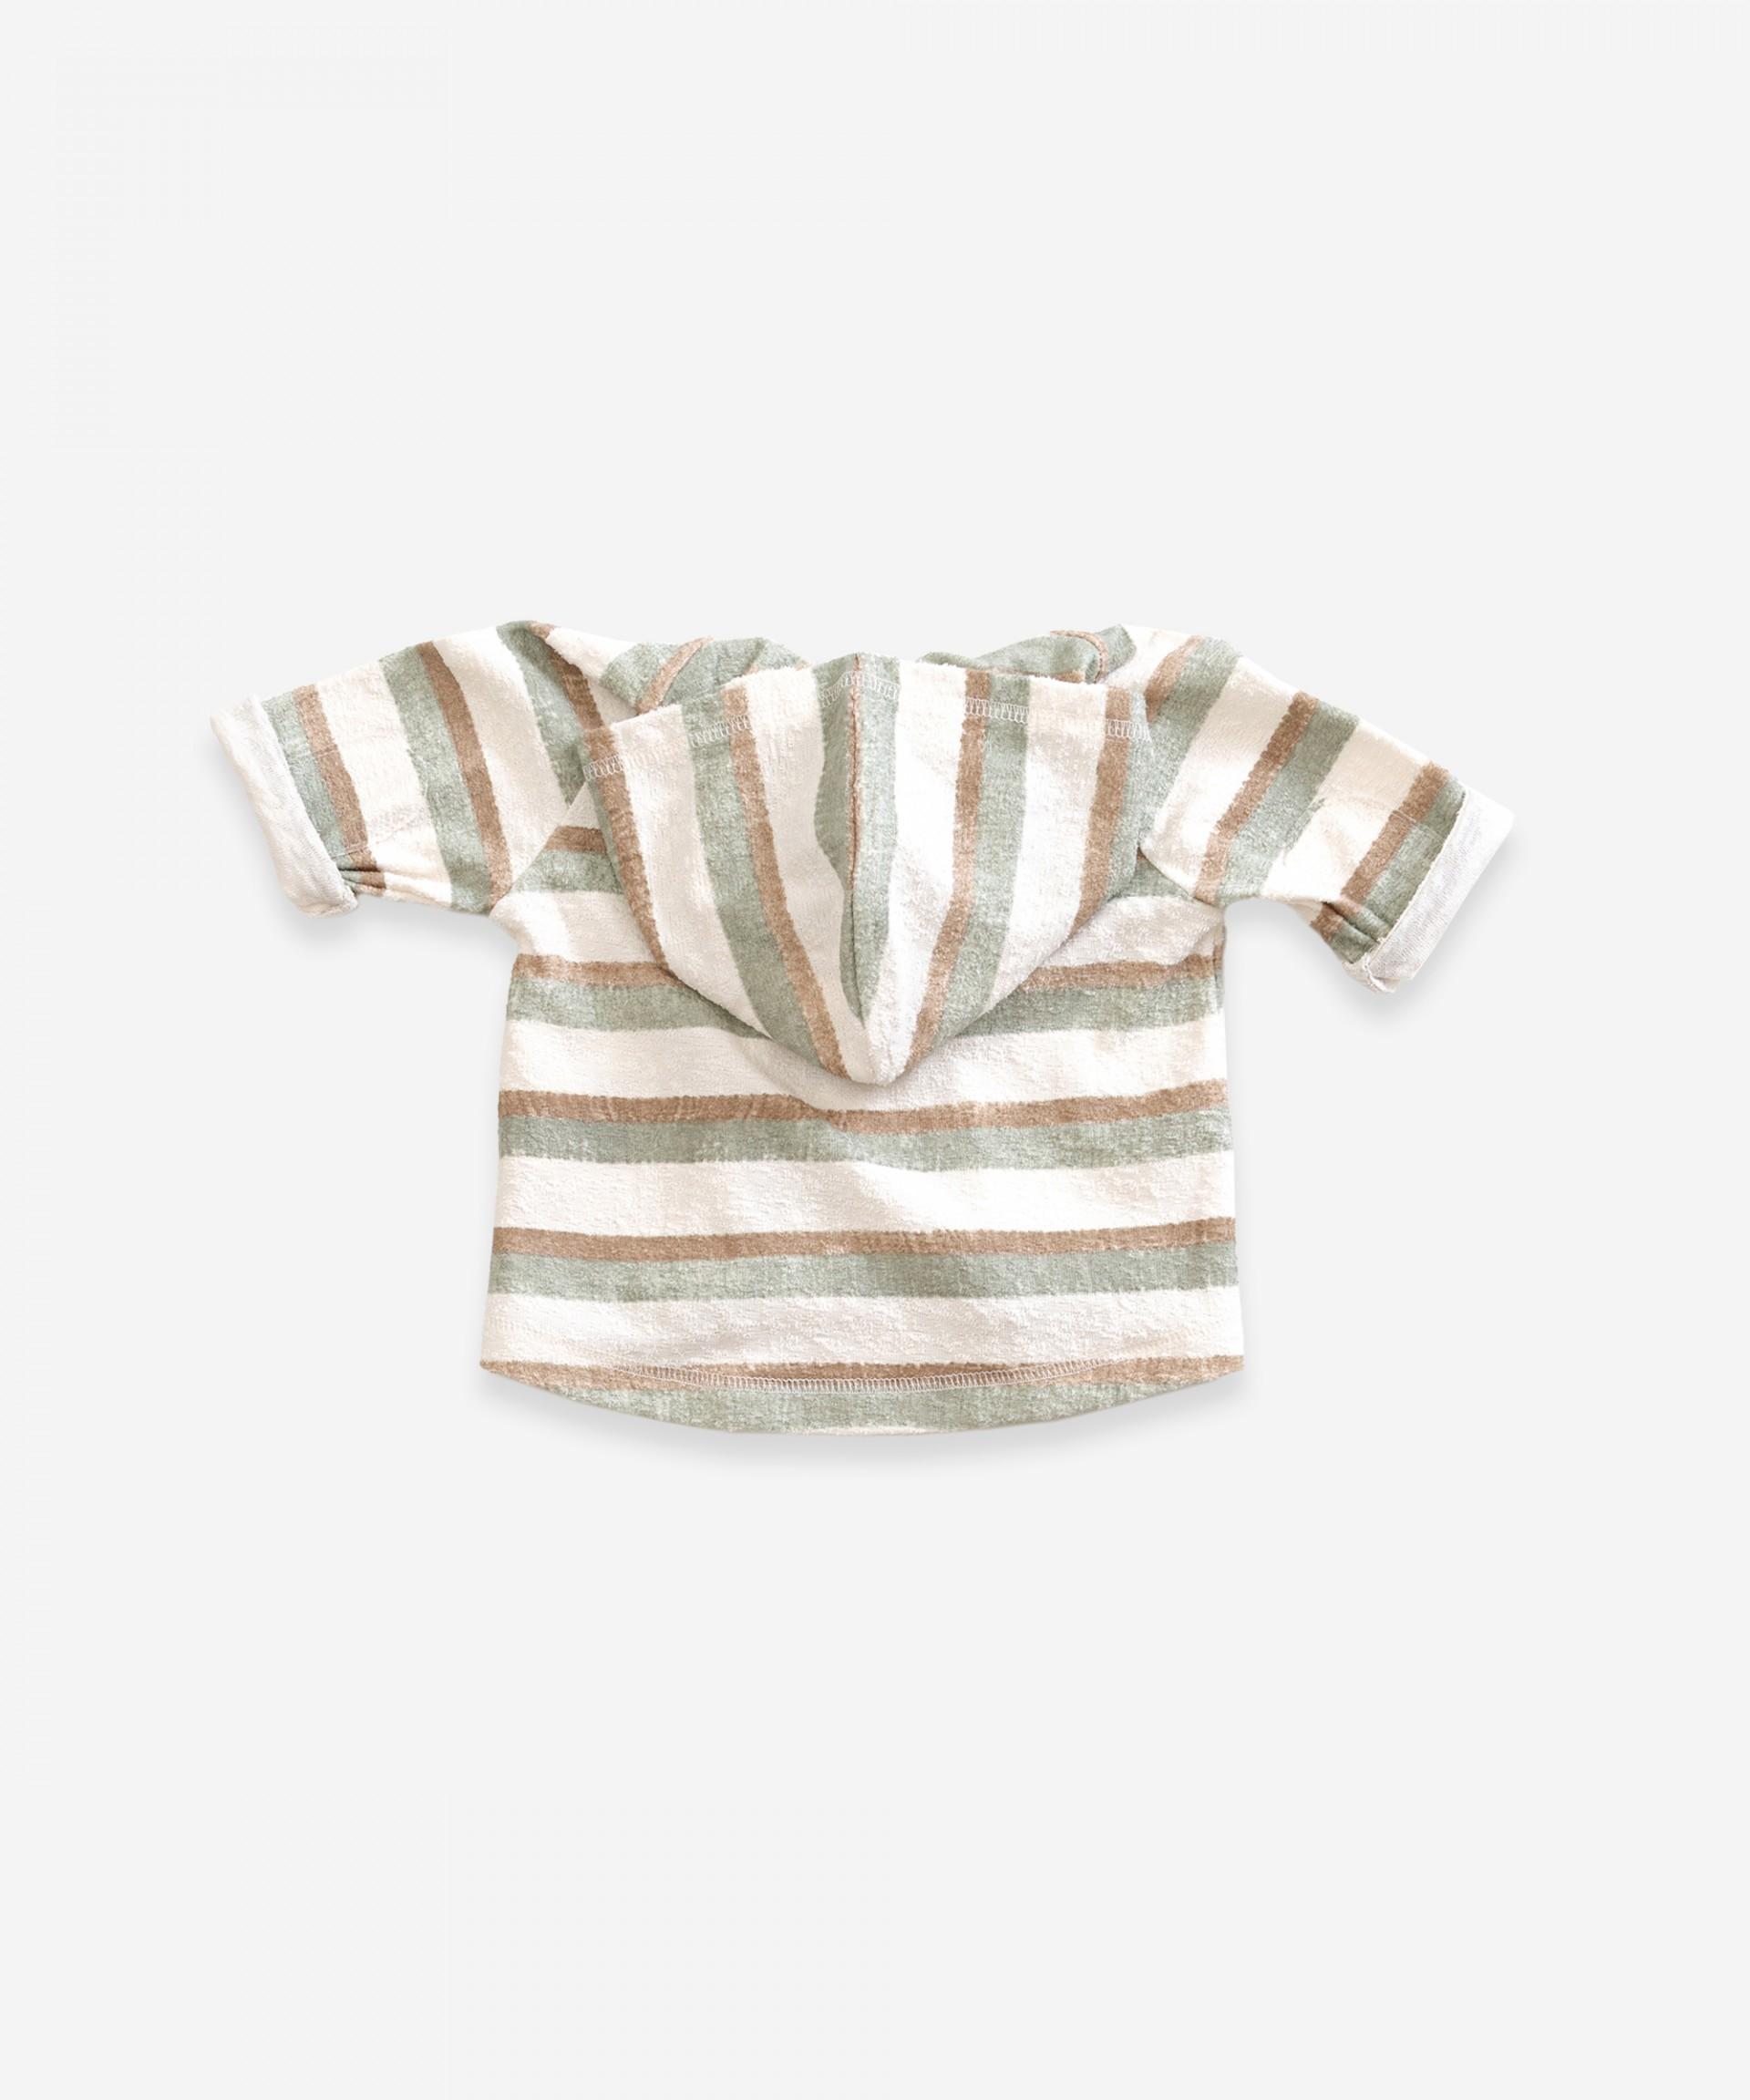 Chaqueta de algodón orgánico | Weaving